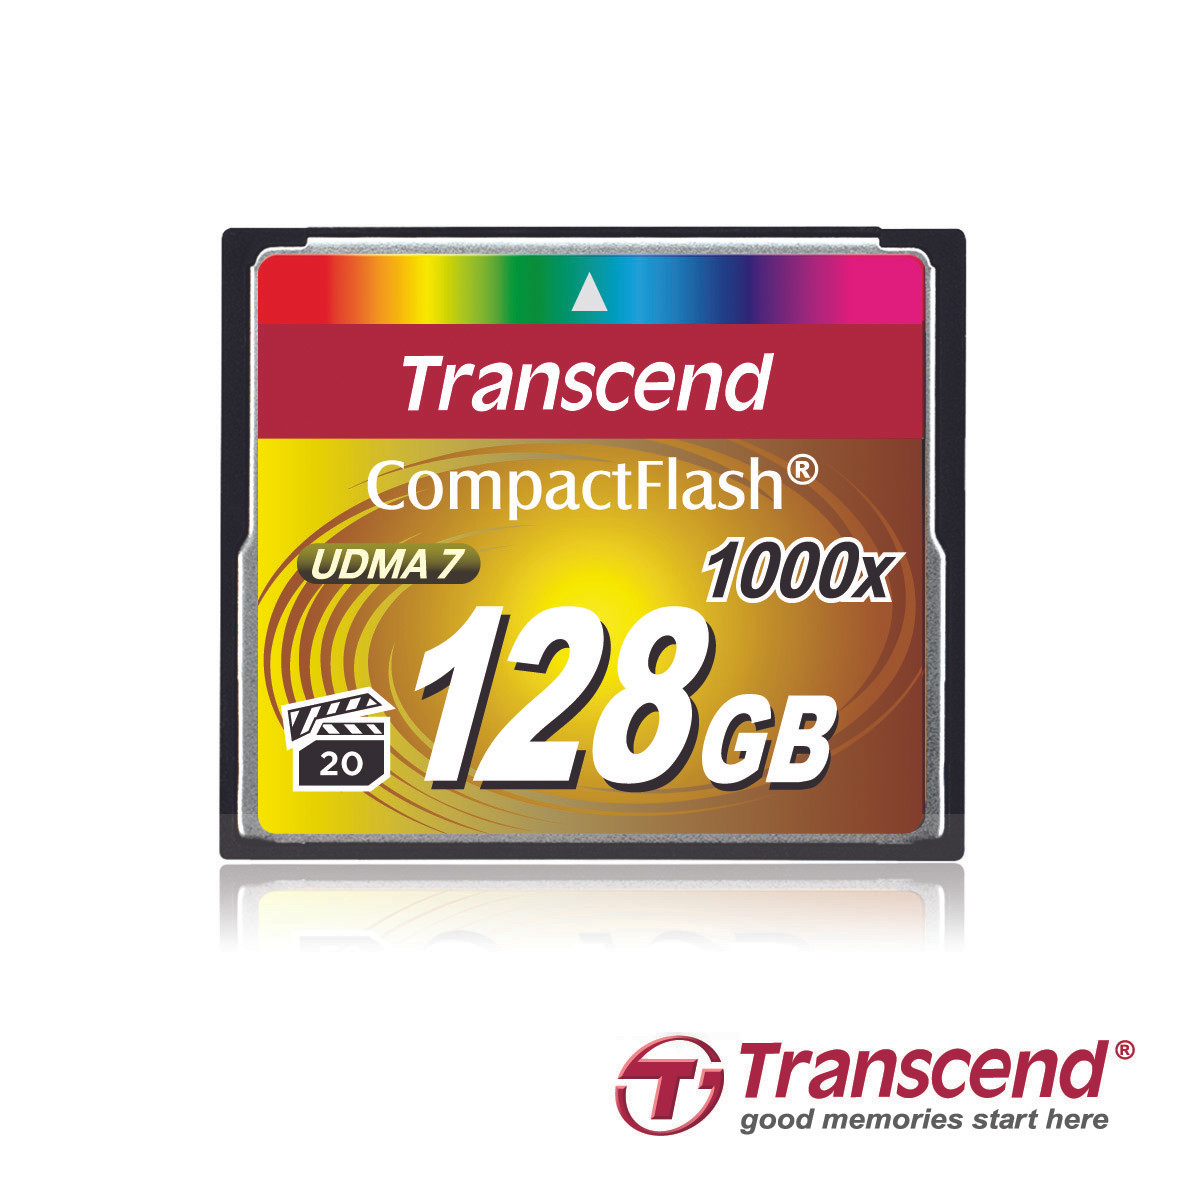 1353935852_128gb-transcendcf1000.jpg